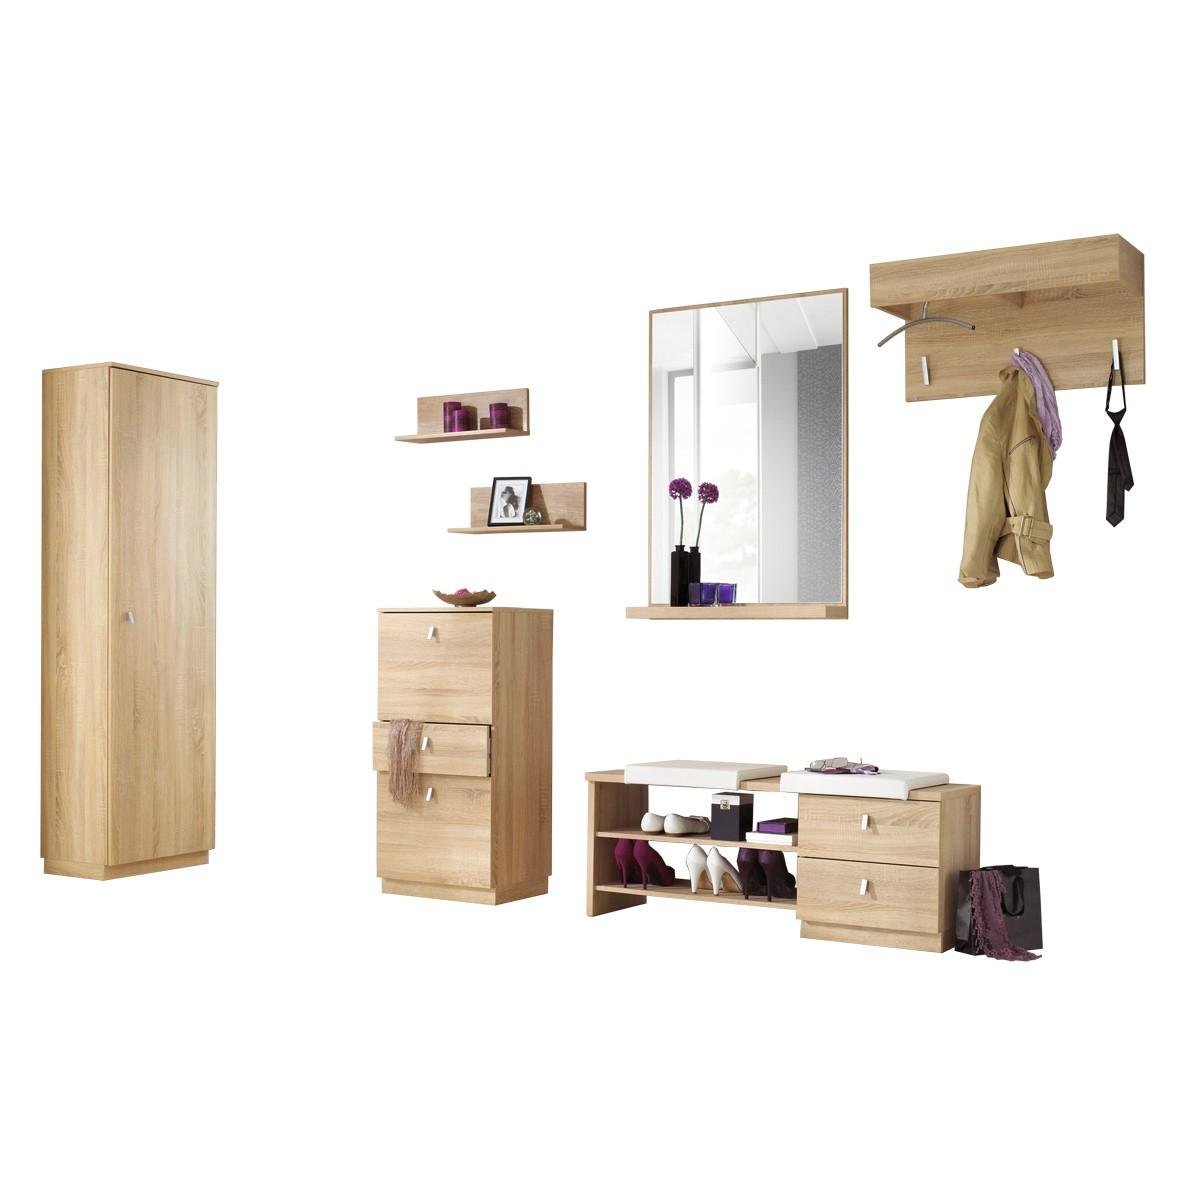 garderoben set gornl nd 6 teilig in eiche s gerau. Black Bedroom Furniture Sets. Home Design Ideas